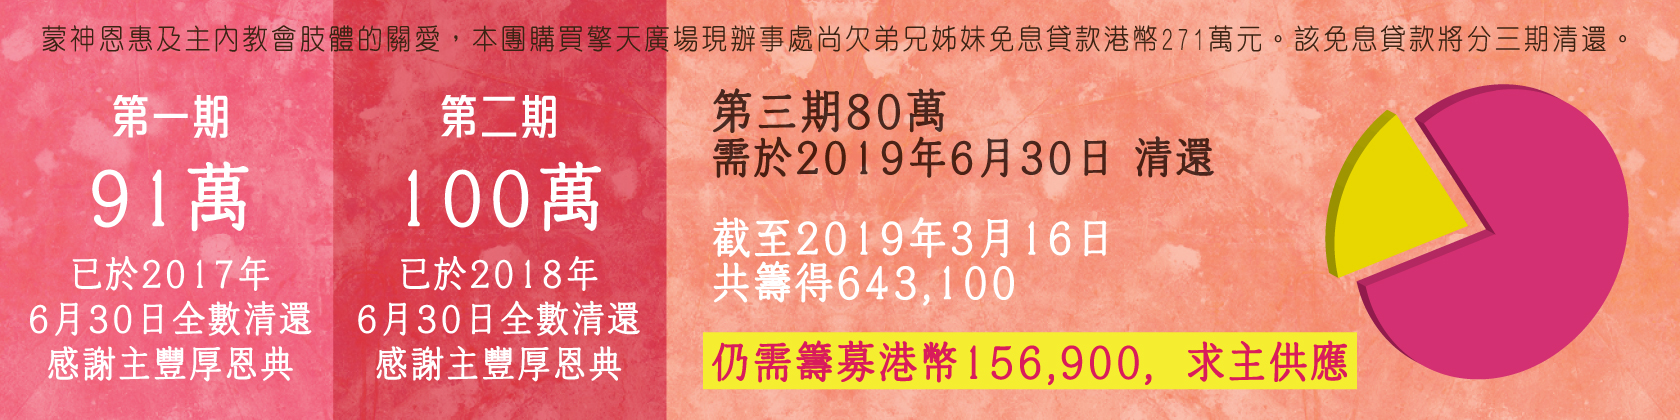 CB-02-web-banner-1680-x-420-03-3